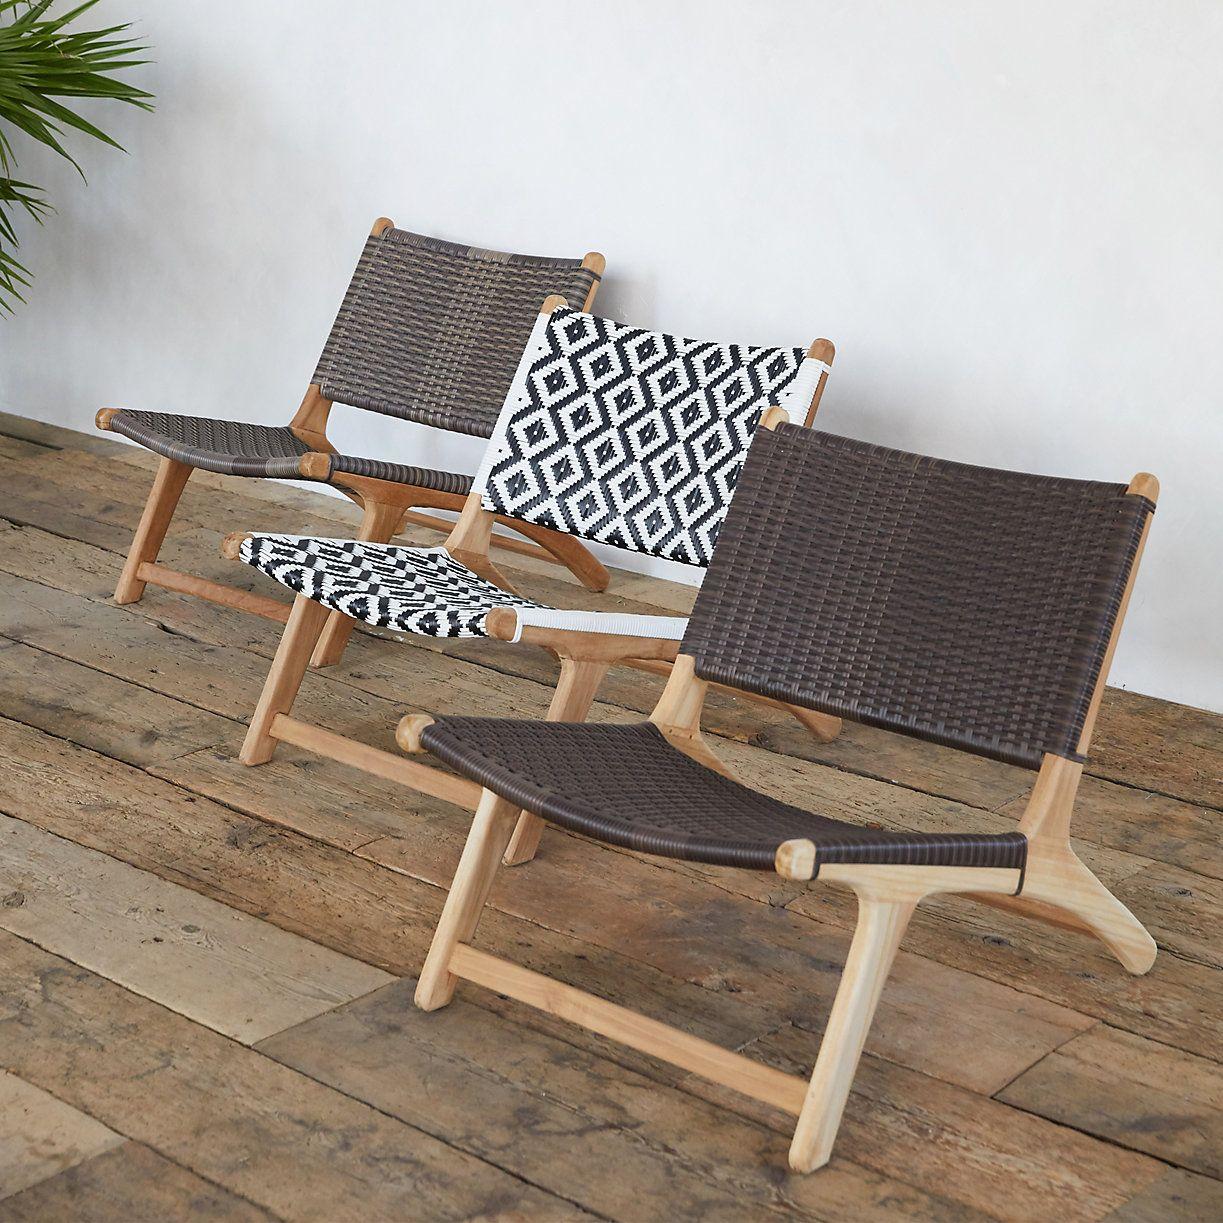 All Weather Wicker Teak Lounge Chair Terrain Teak Lounge Chair Outdoor Chairs Contemporary Lounge Chair